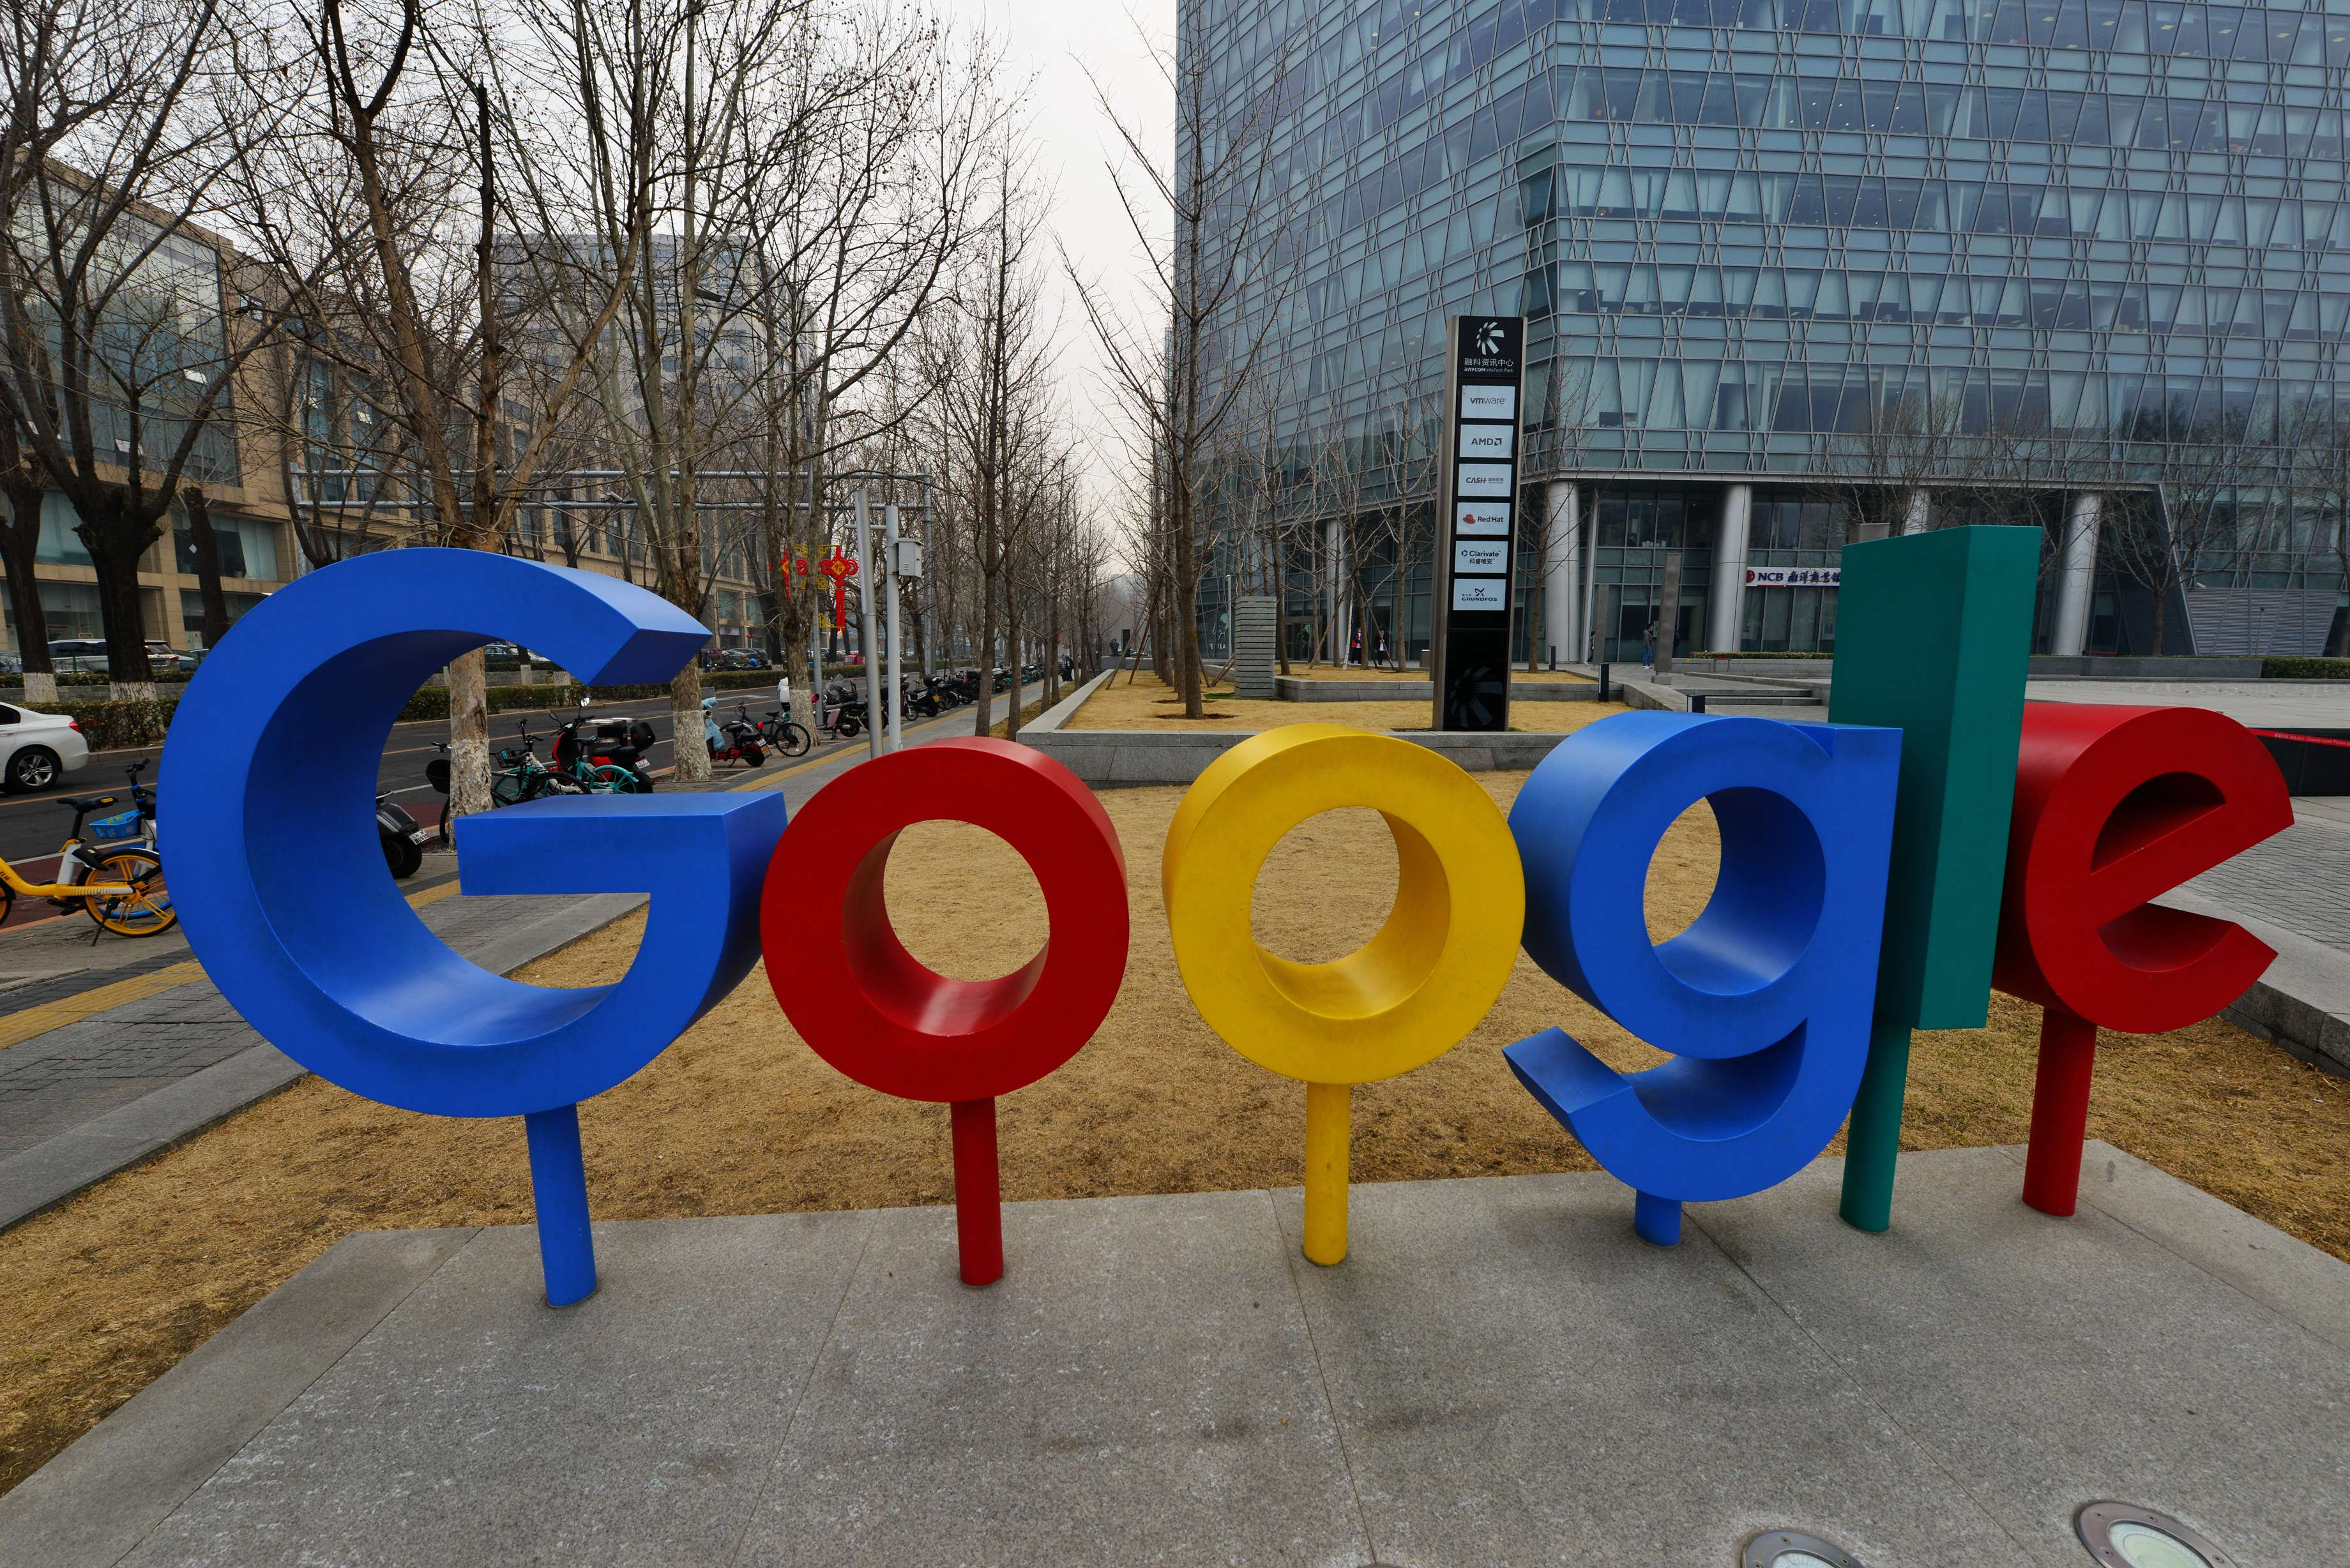 Google antitrust lawsuit amended to target Chrome's Privacy Sandbox | Engadget